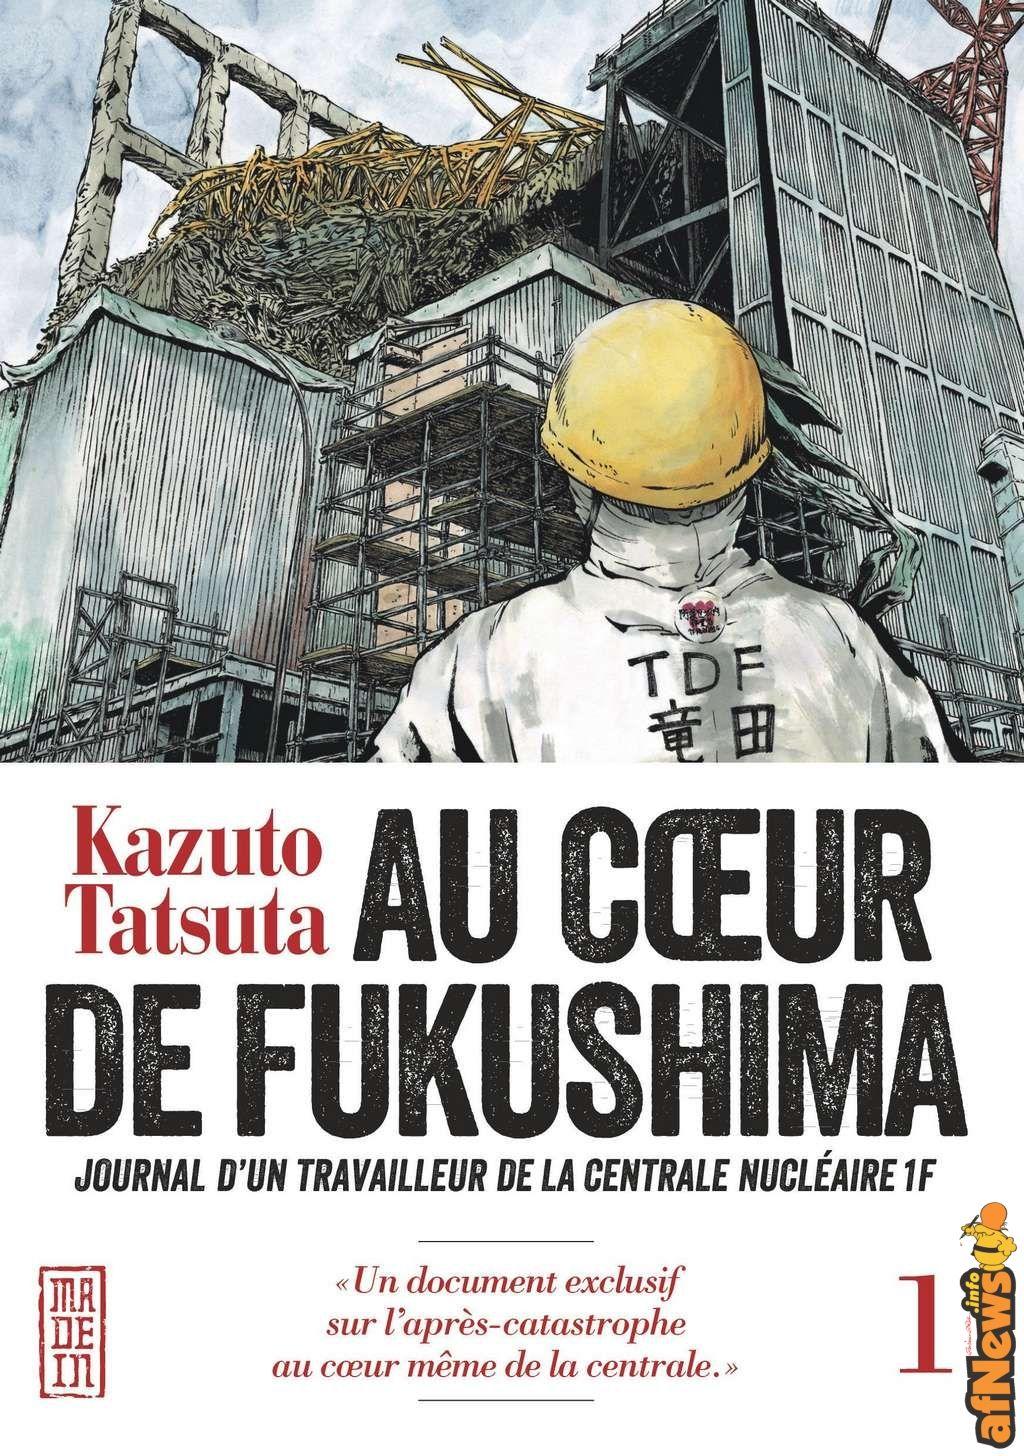 Au cœur de Fukushima 1 di Kazuto Tatsuta - http://www.afnews.info/wordpress/2016/03/13/au-coeur-de-fukushima-1-di-kazuto-tatsuta/